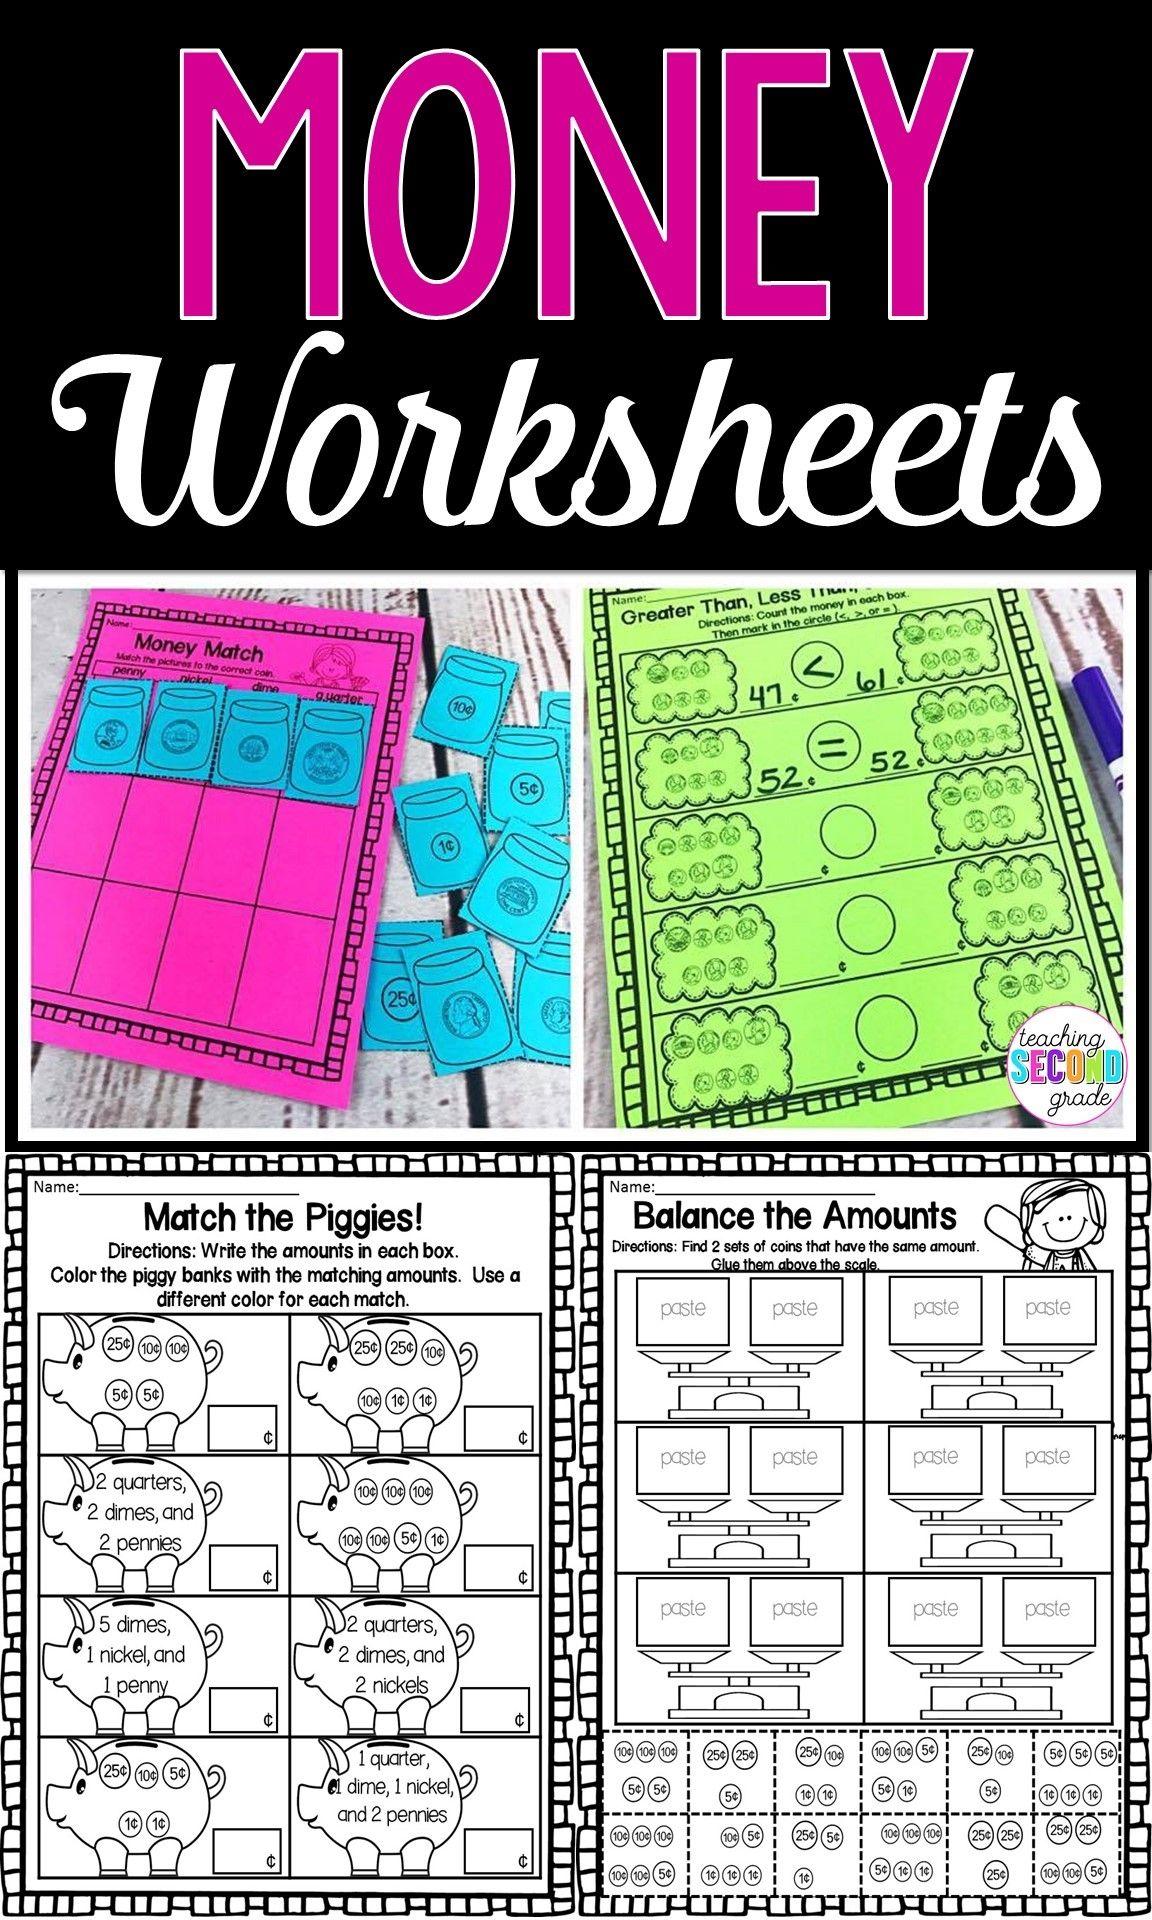 19 Best Identifying Money Worksheets For 1st Grade Images